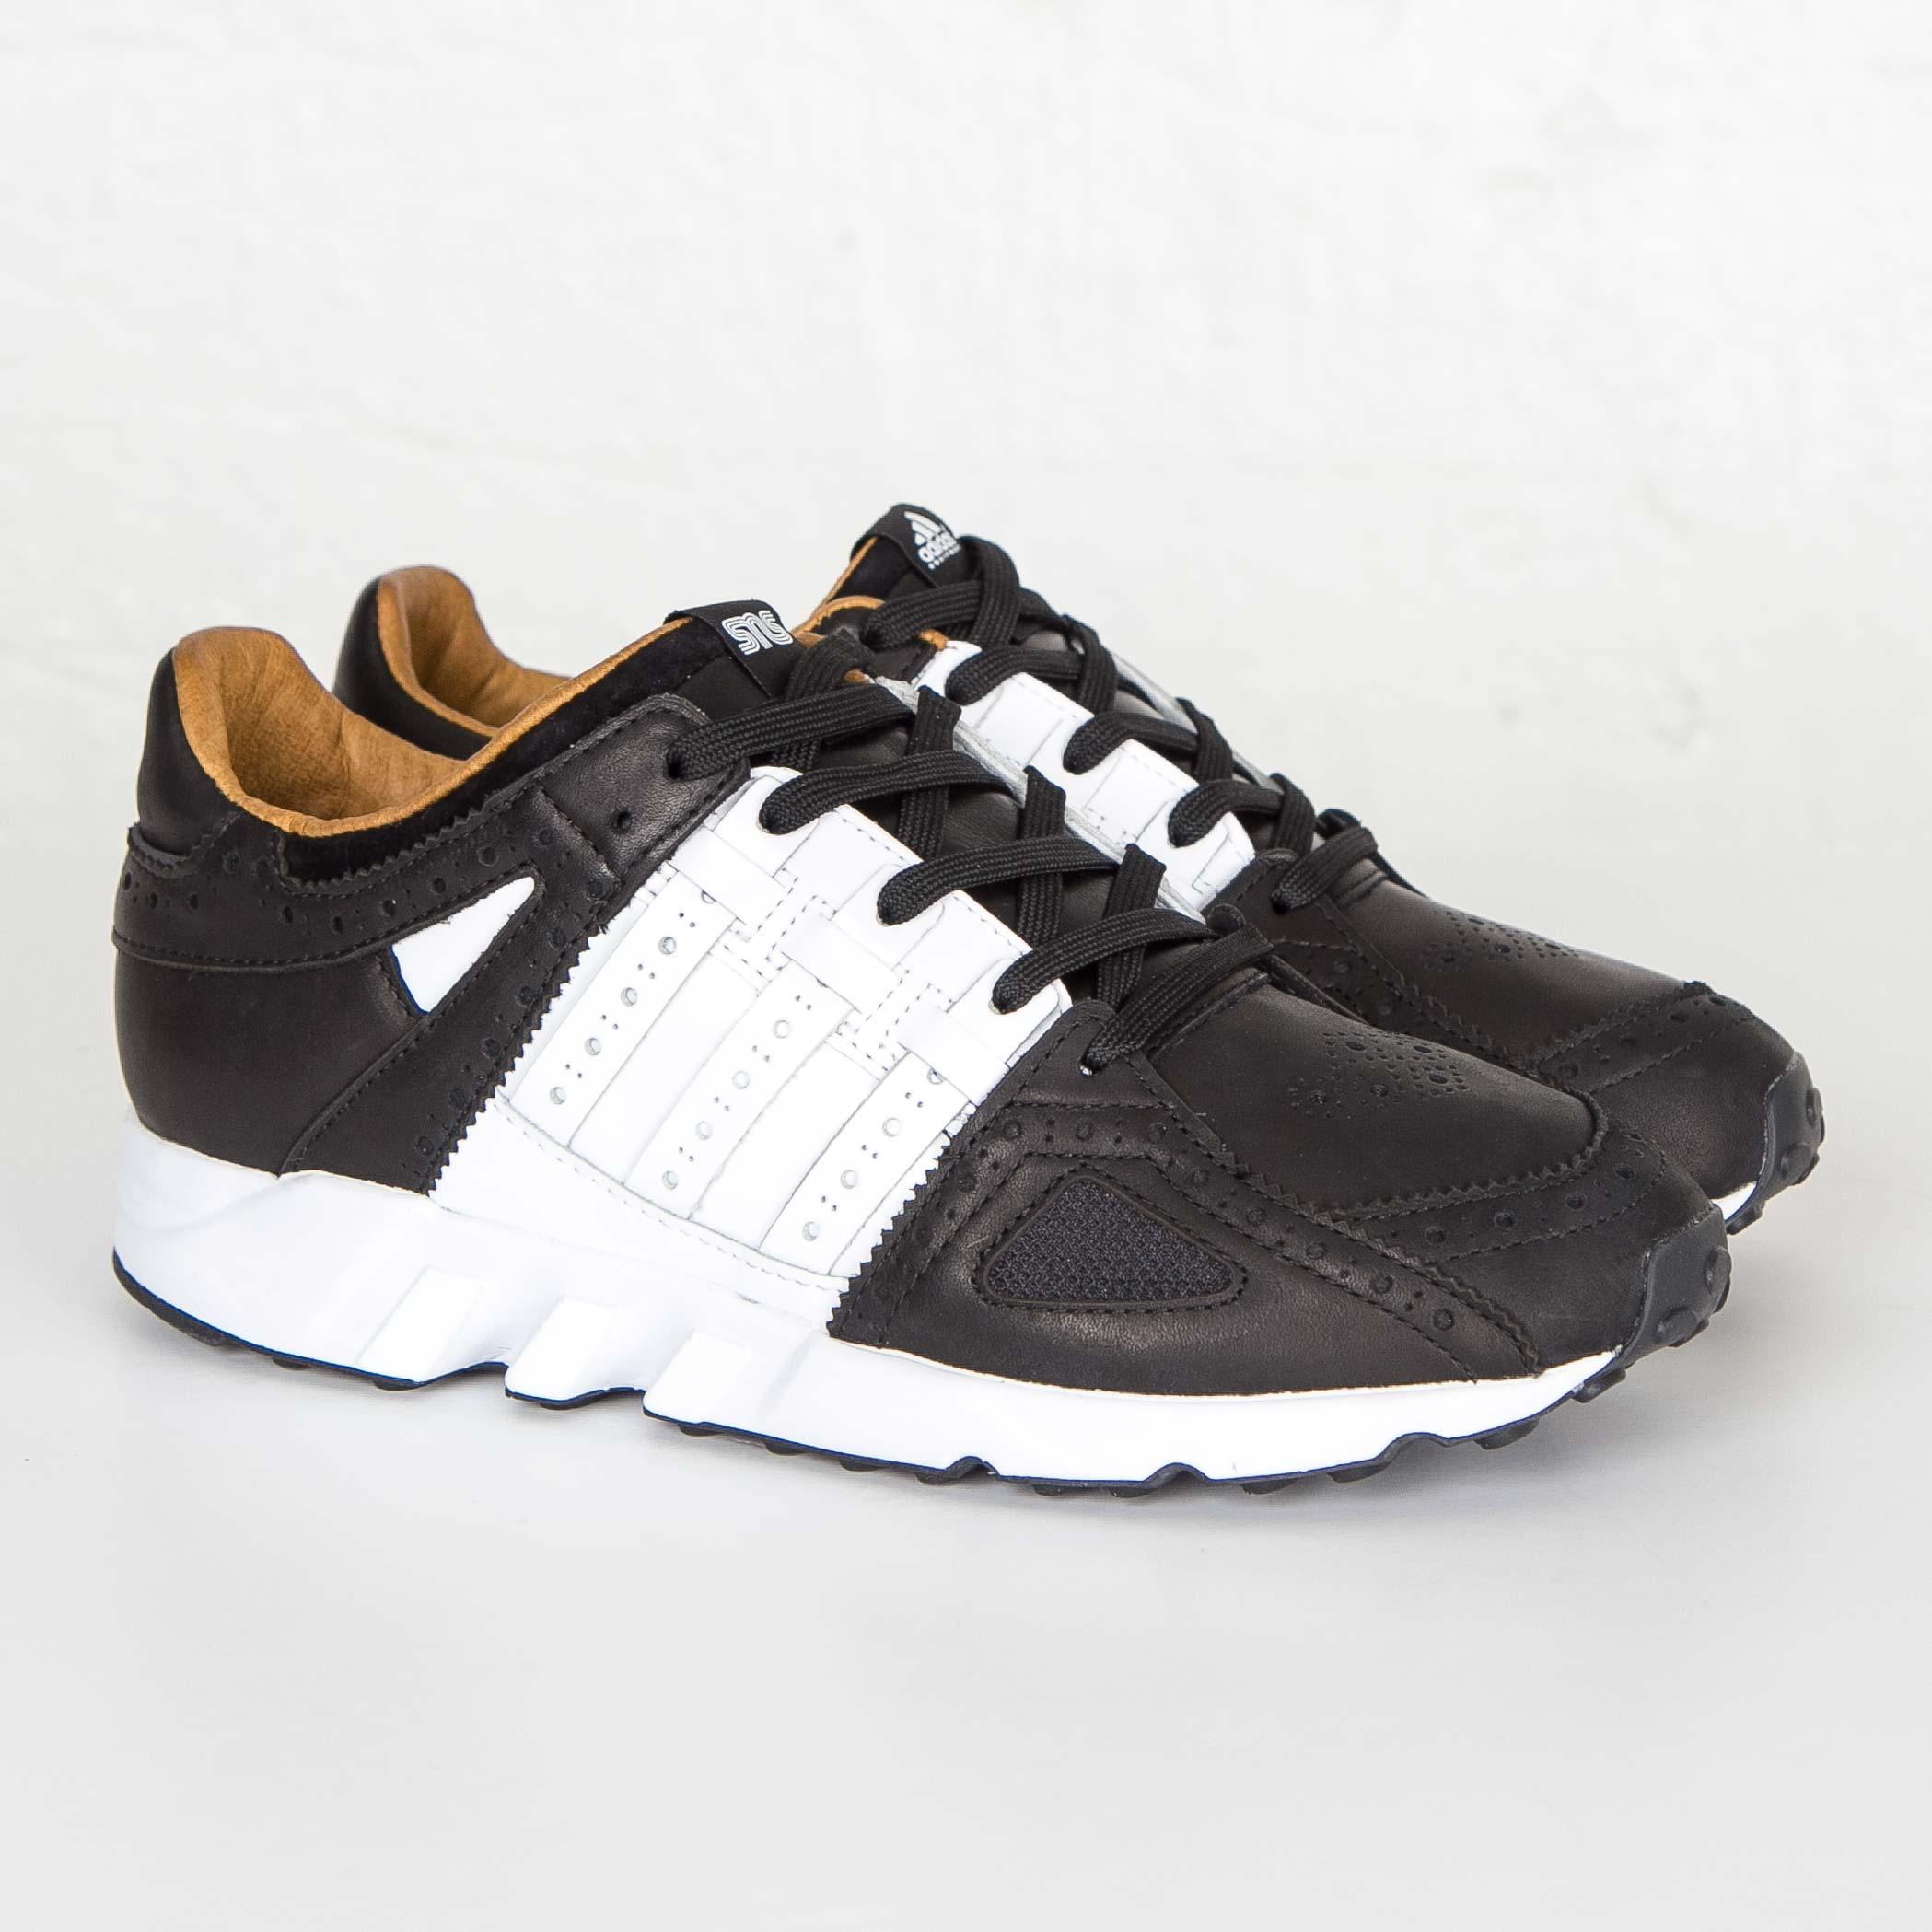 88f62589 adidas Equipment Running Guidance 93 - Af5755 - Sneakersnstuff ...